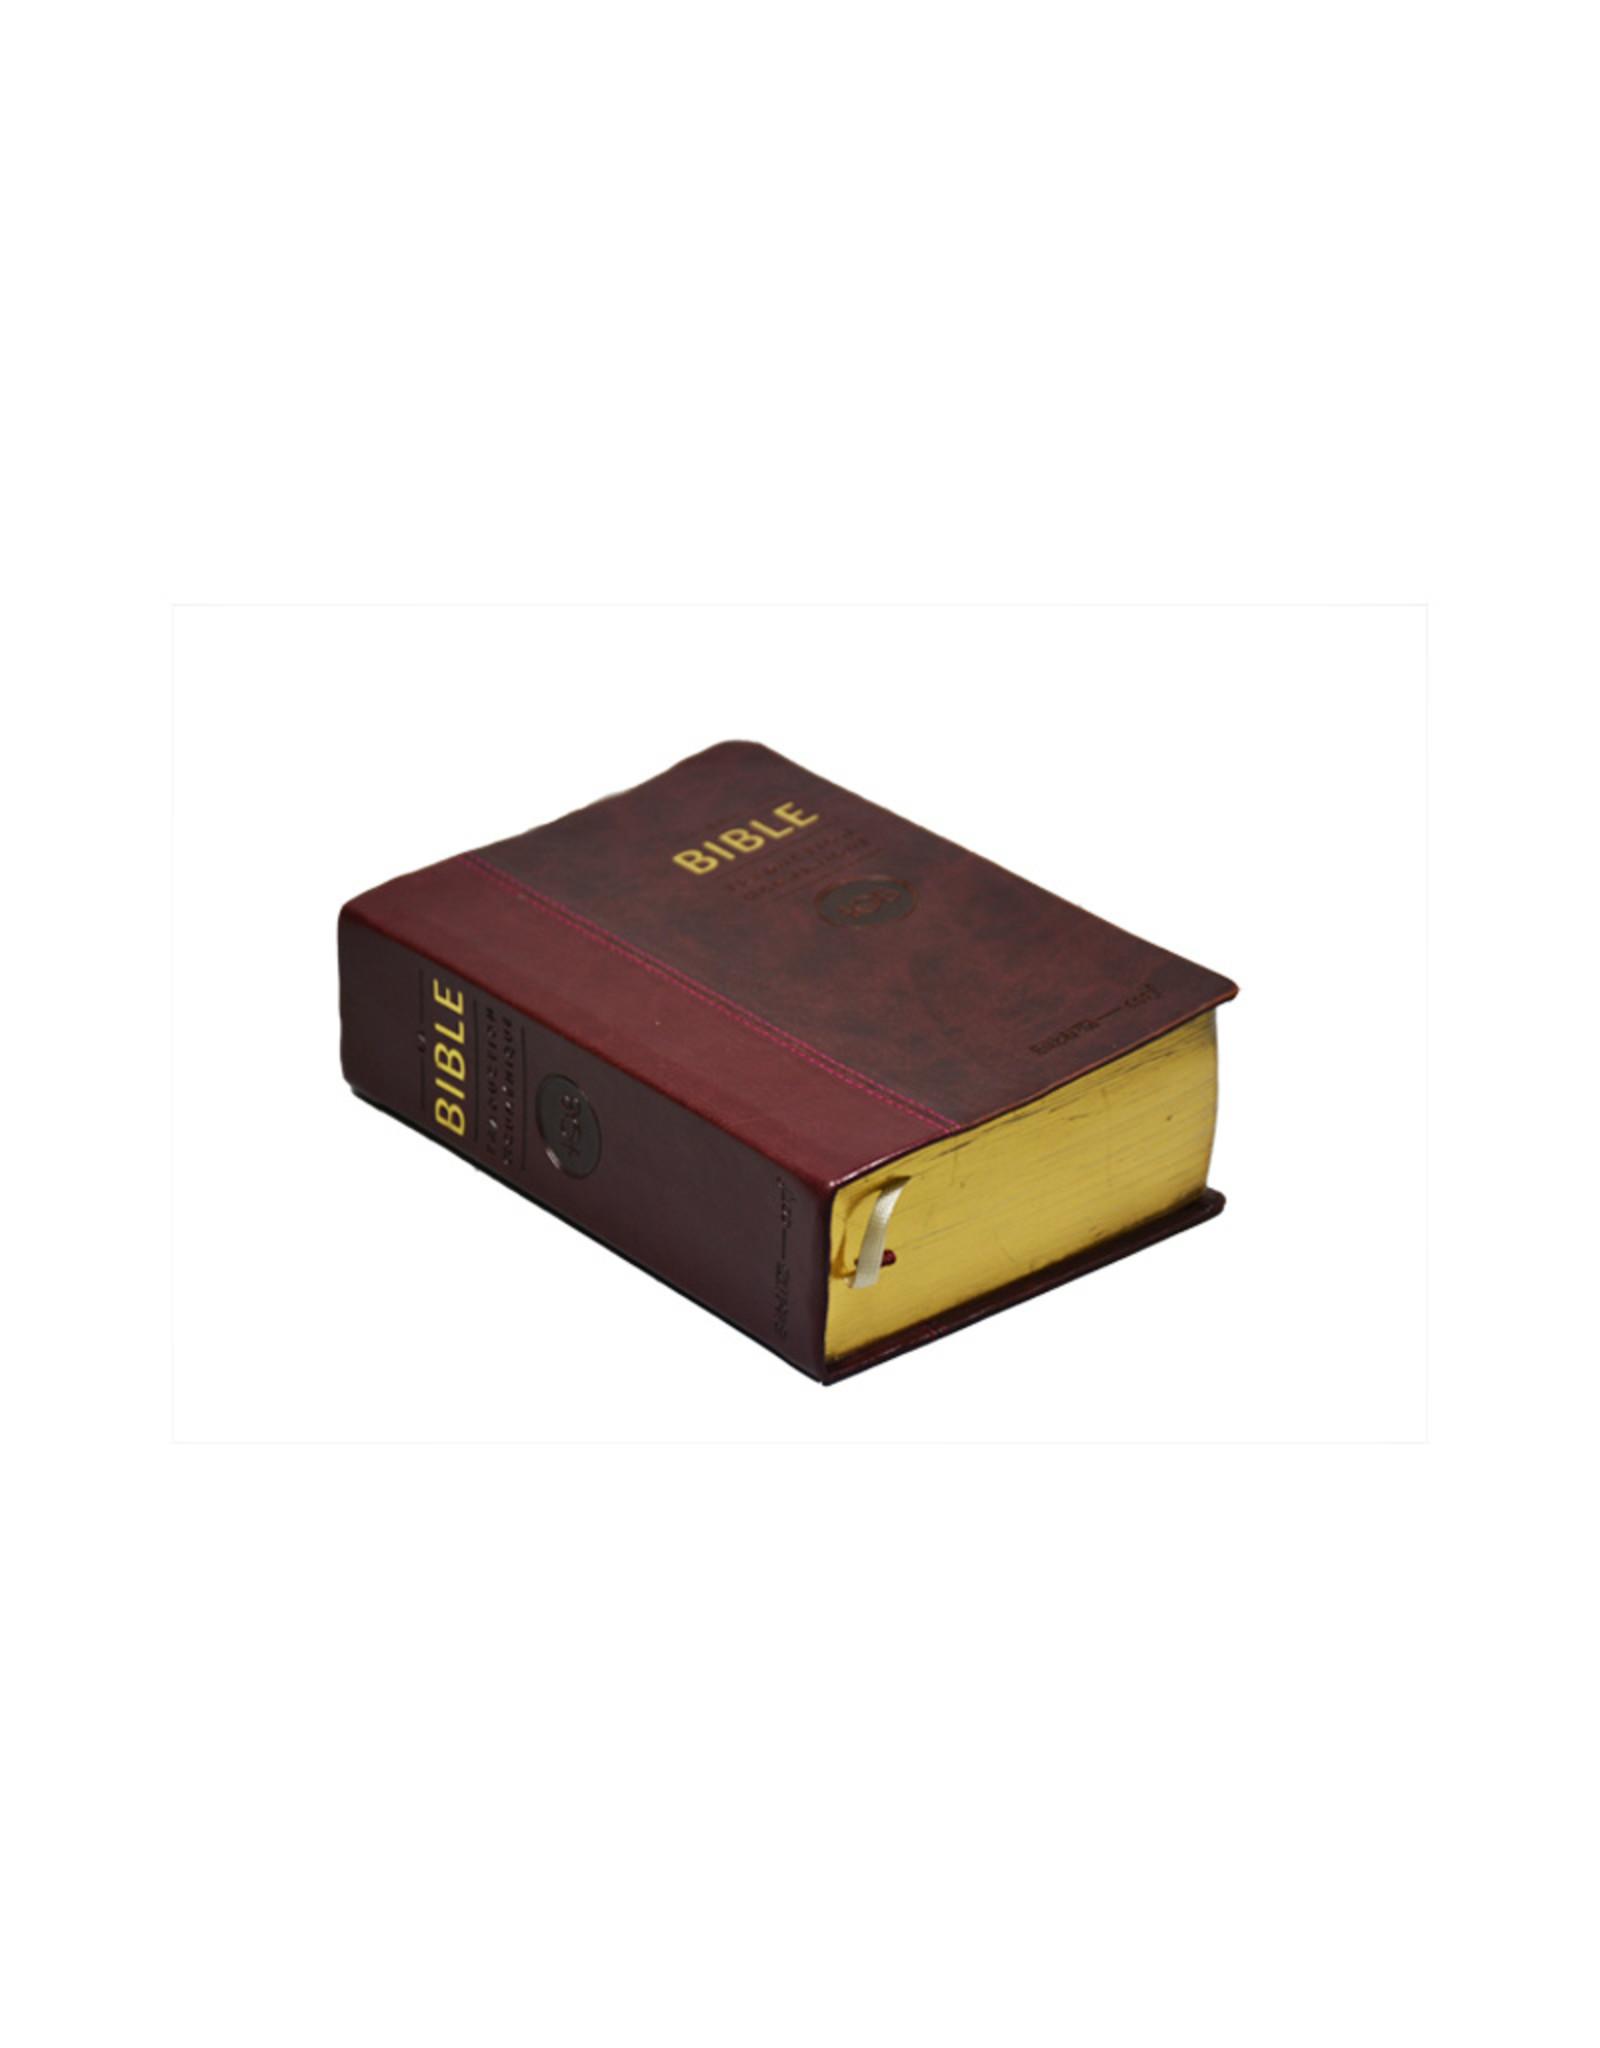 Société Biblique / Bible Society French bible ecumenical translation bible: brown faux leather